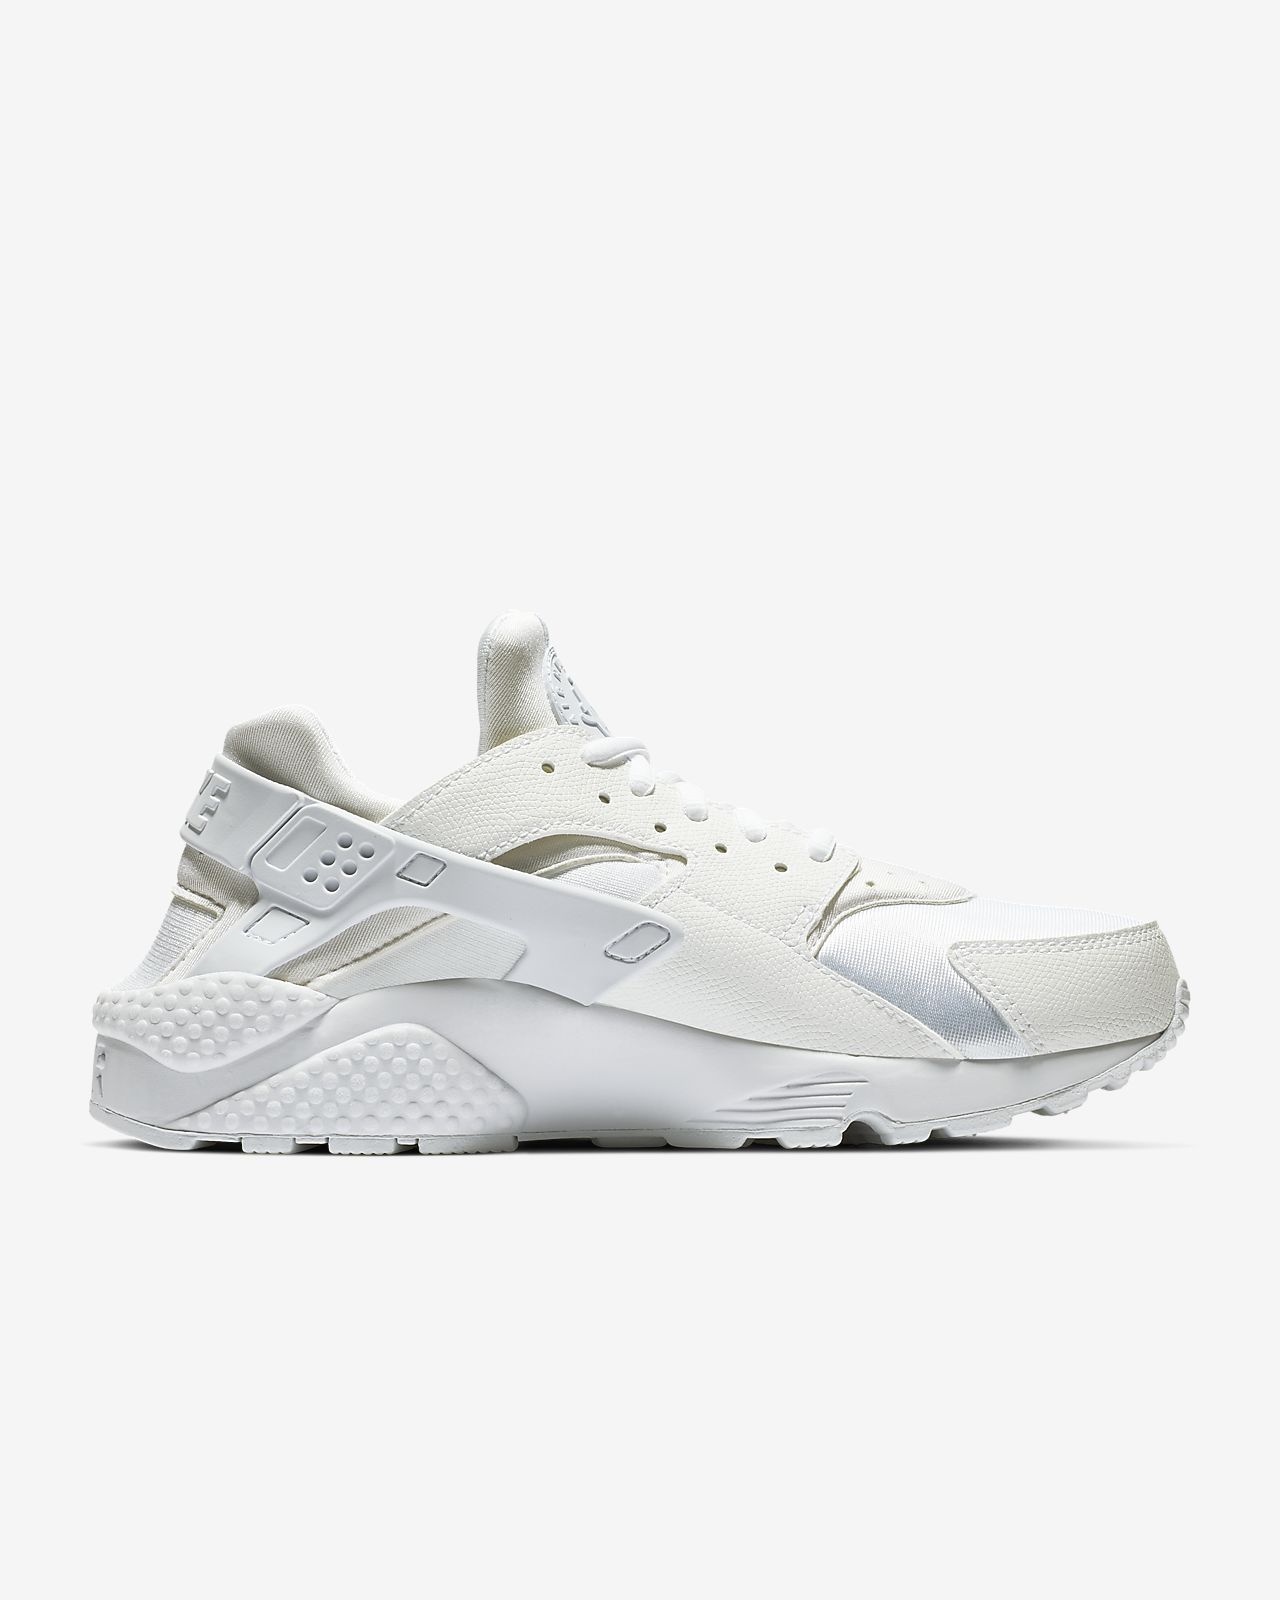 4ac009280e Nike Air Huarache Women's Shoe. Nike.com GB